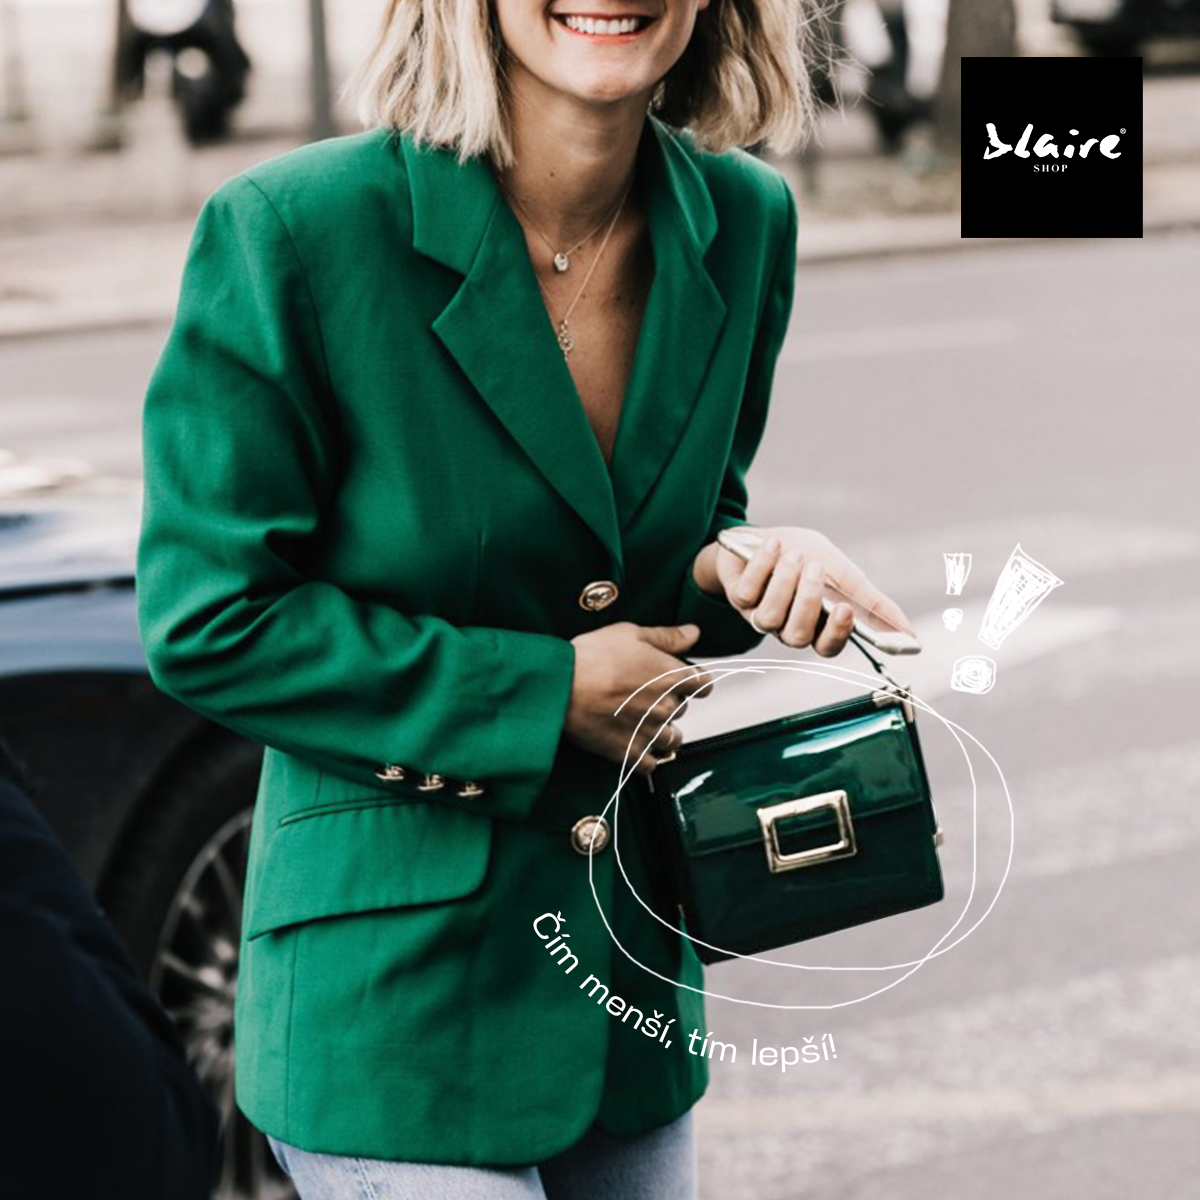 95fdf753a6 BLAIRE trend tip  Módní blogerky milují mini kabelky! - Blaire shop